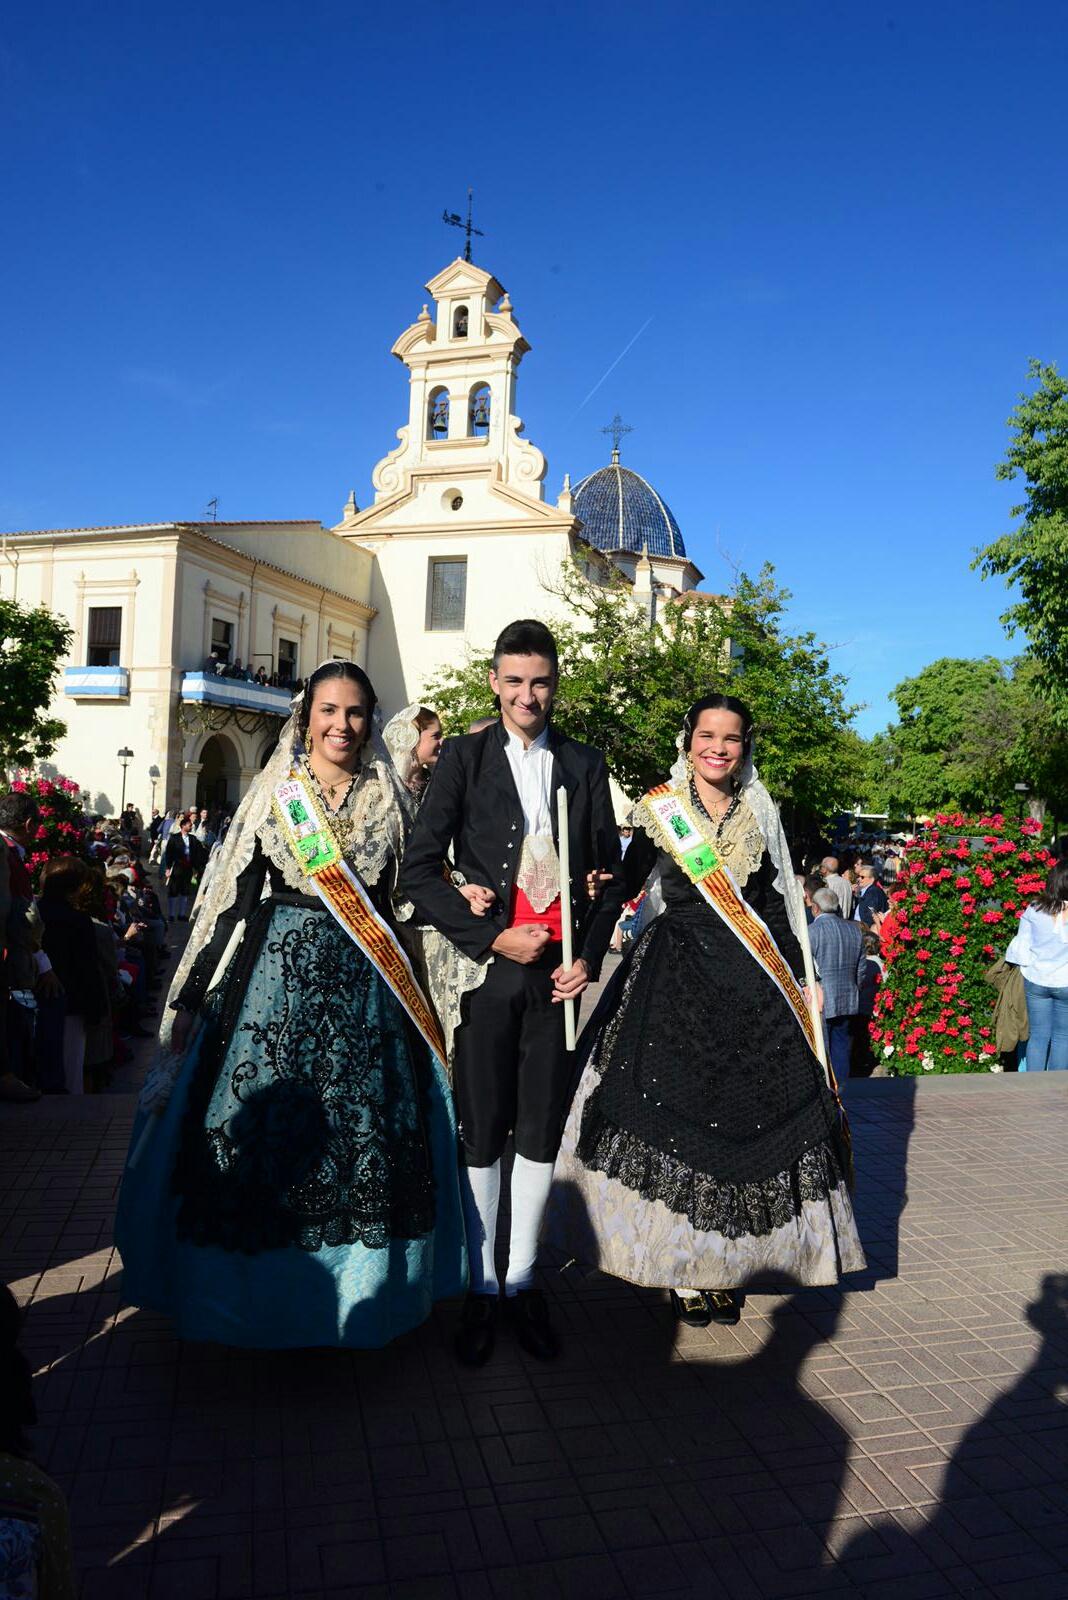 170507-procesion-lledo-pilar-195532